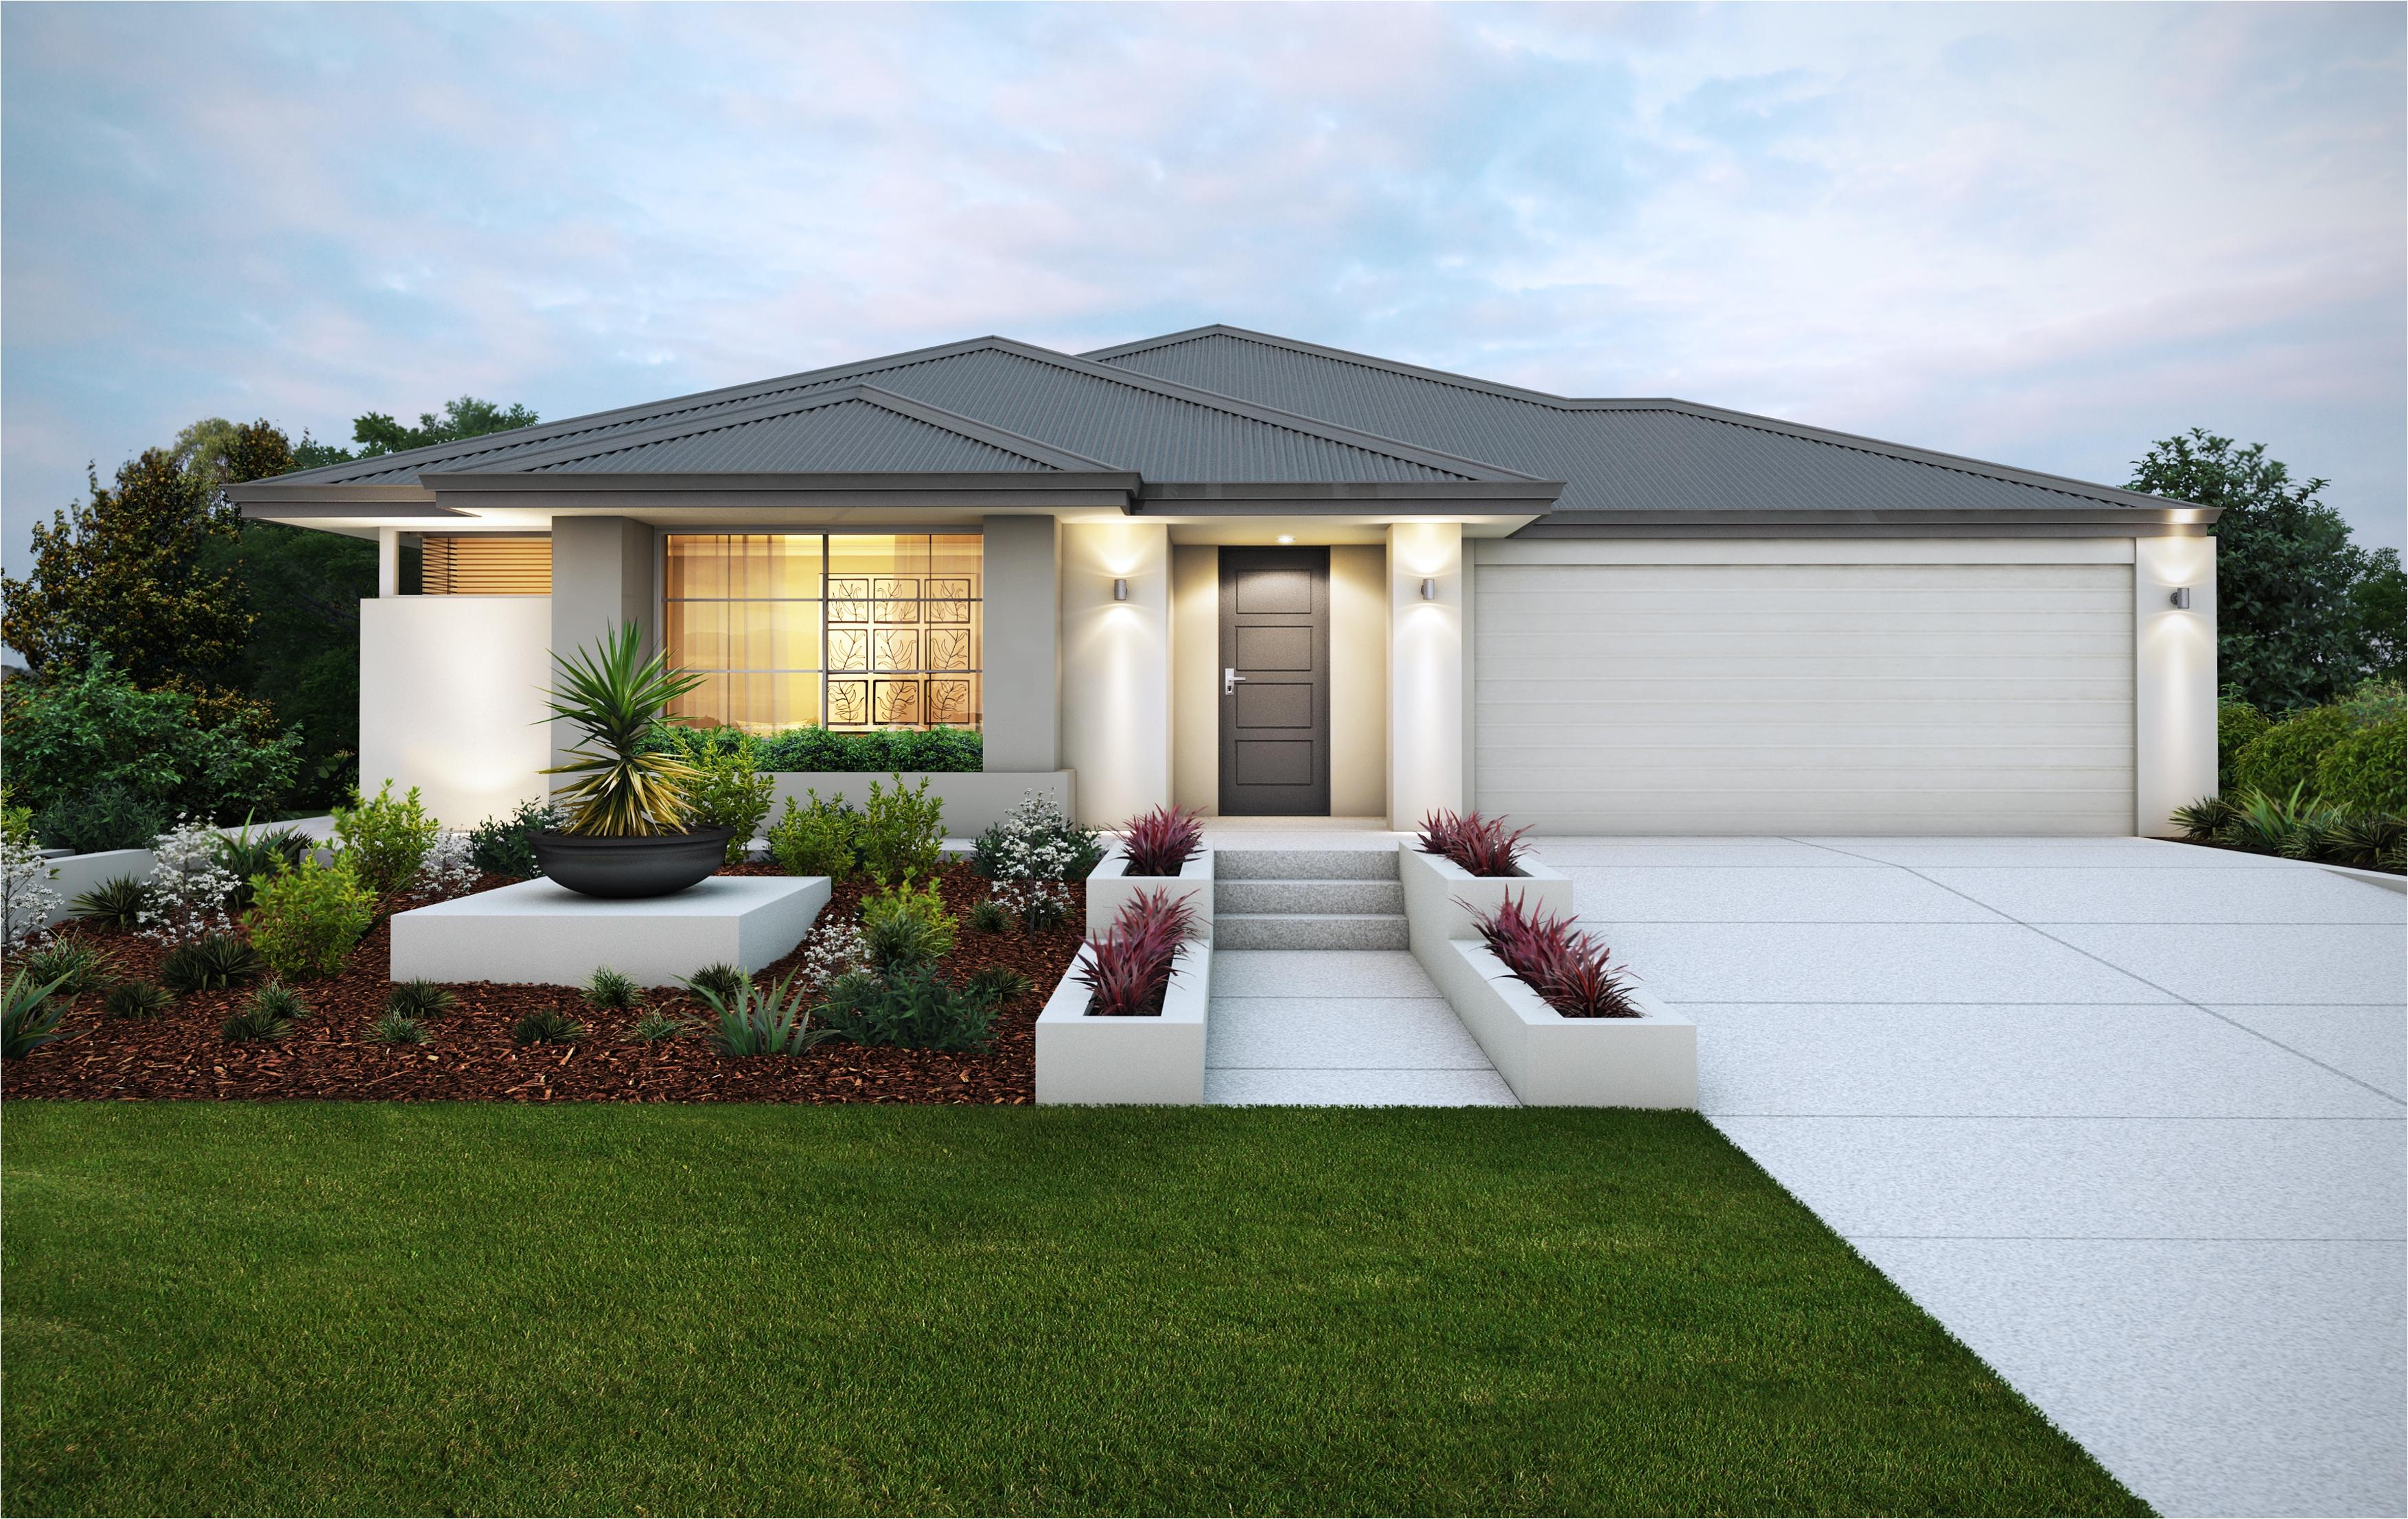 house designs under 200 000 ipeficom house plans under 200 000 dollars